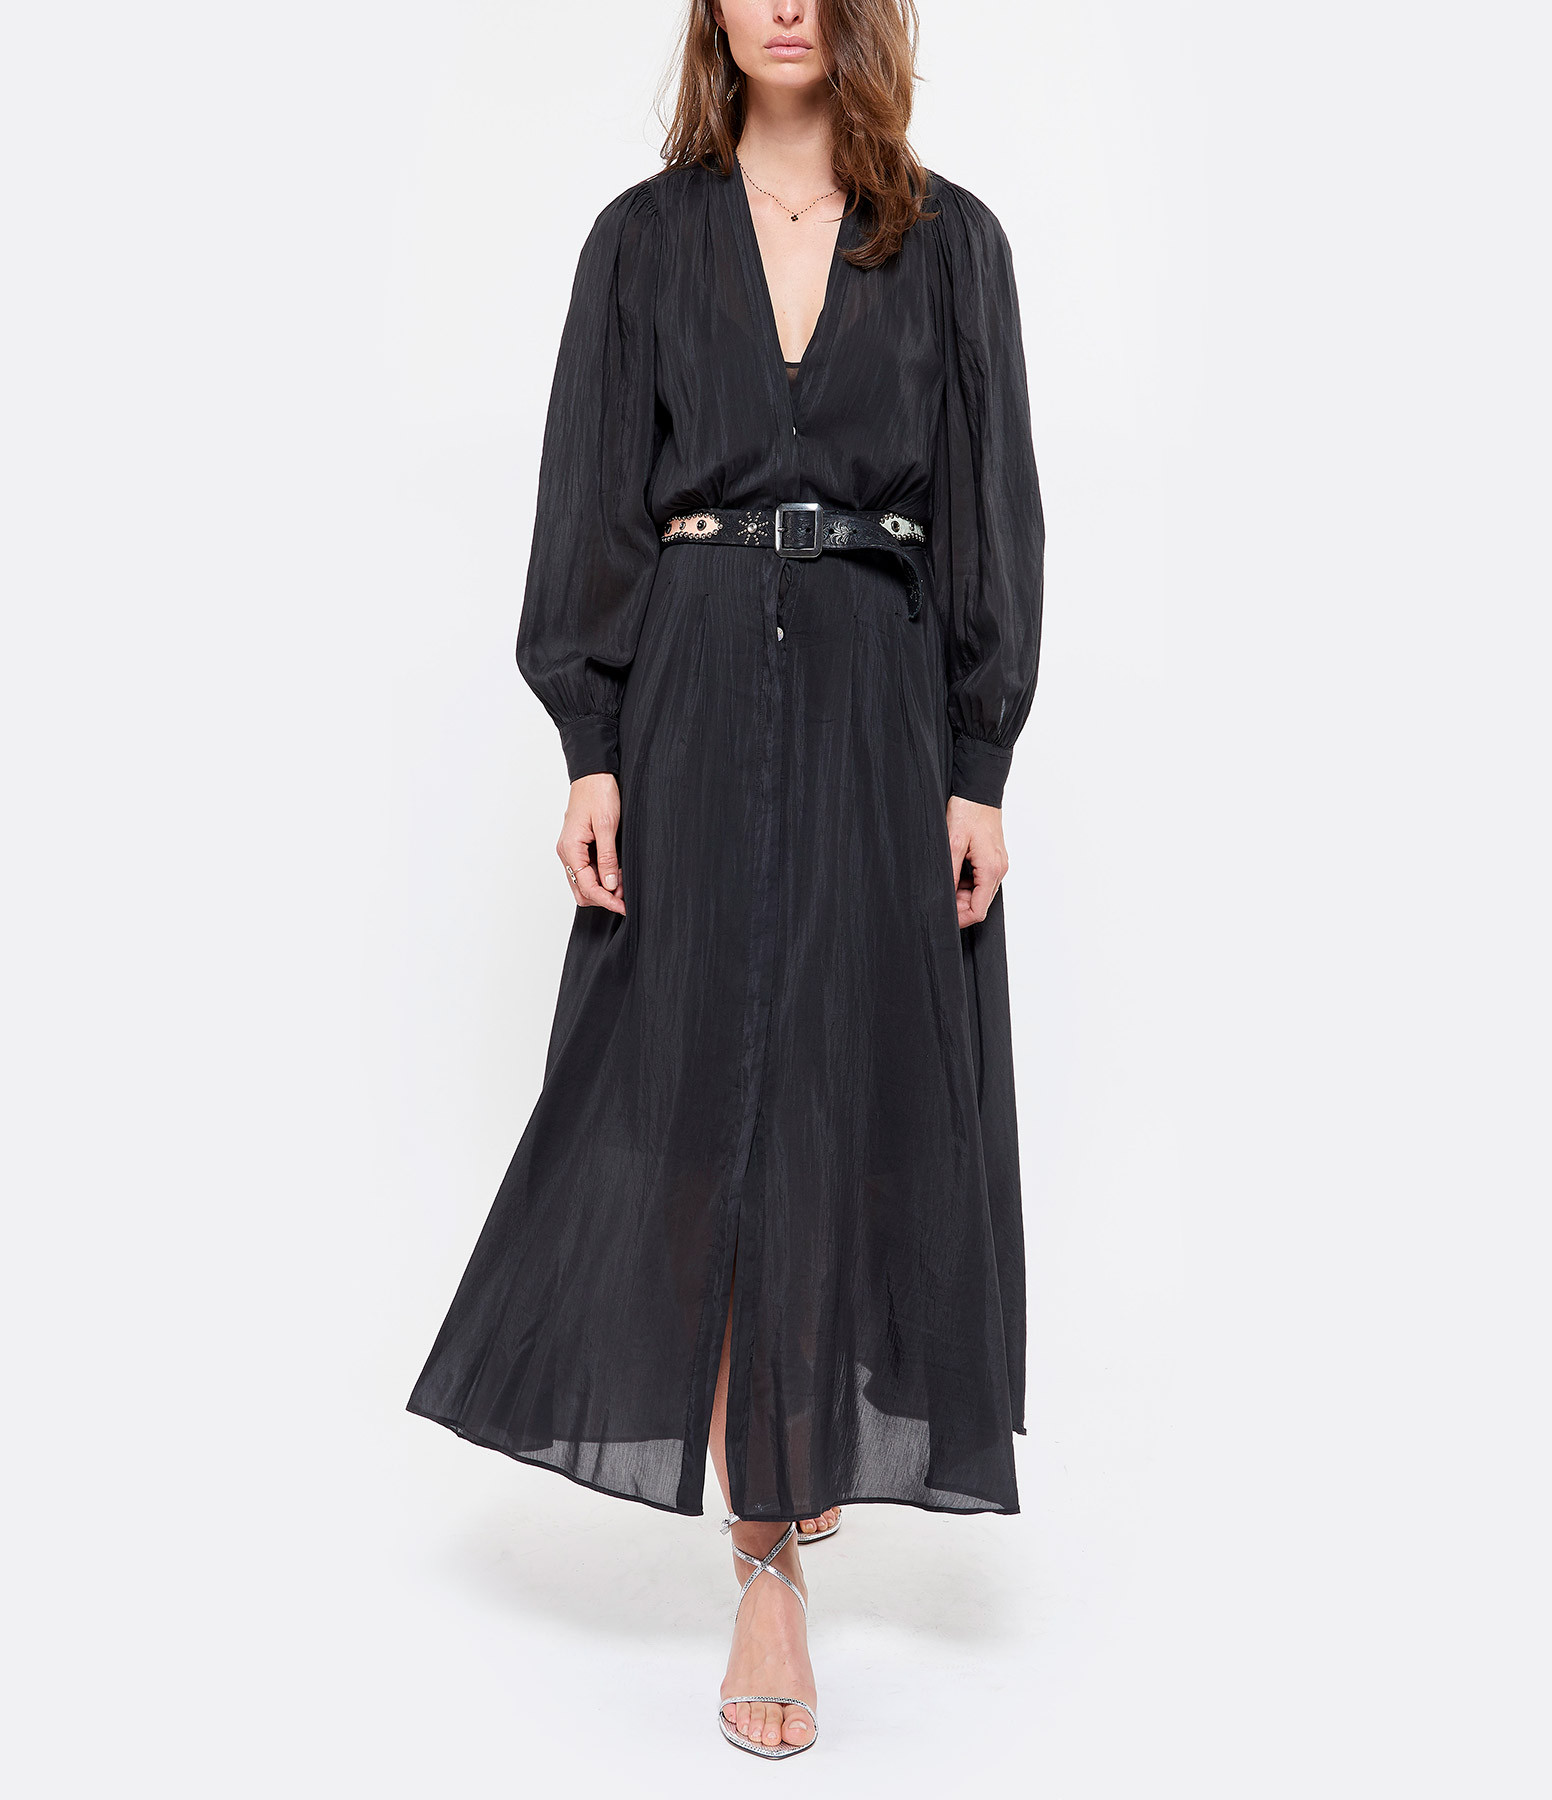 FORTE_FORTE - Robe Coton Voile Noir